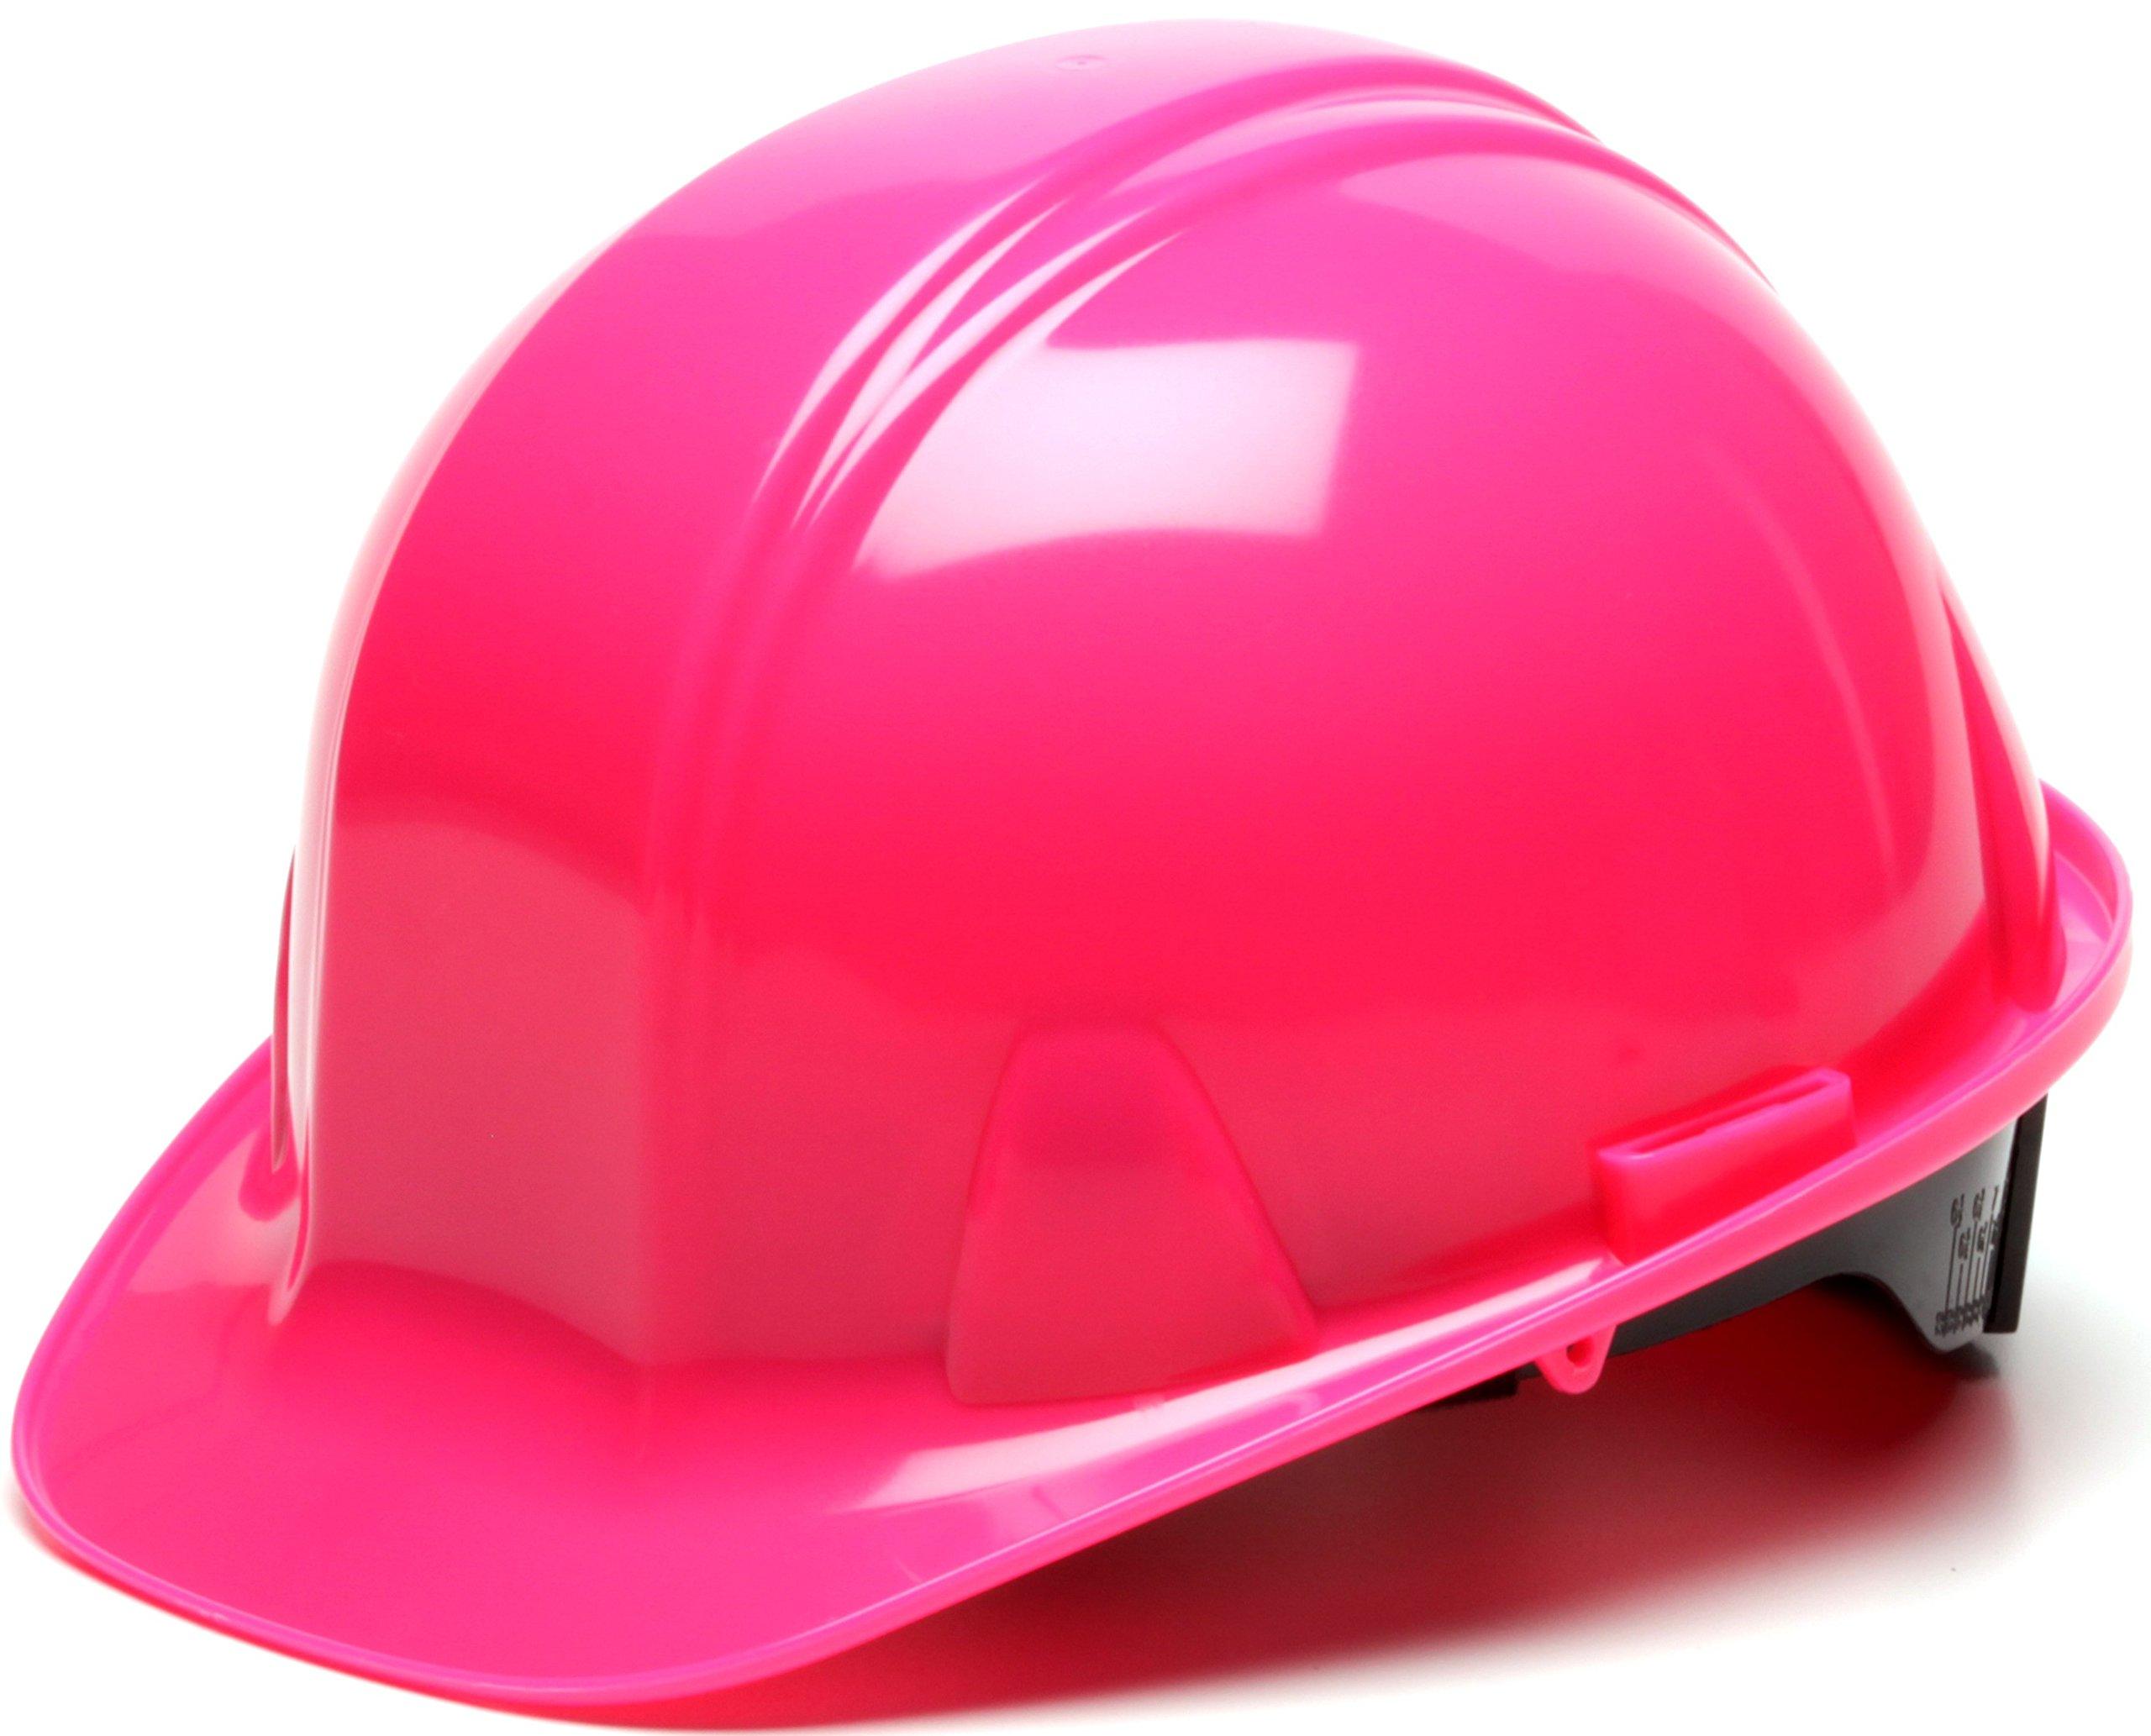 Pyramex Cap Style 4 Point Ratchet Suspension Hard Hat with Rain Trough - Comfortable Low Profile Design, Hi Vis Pink